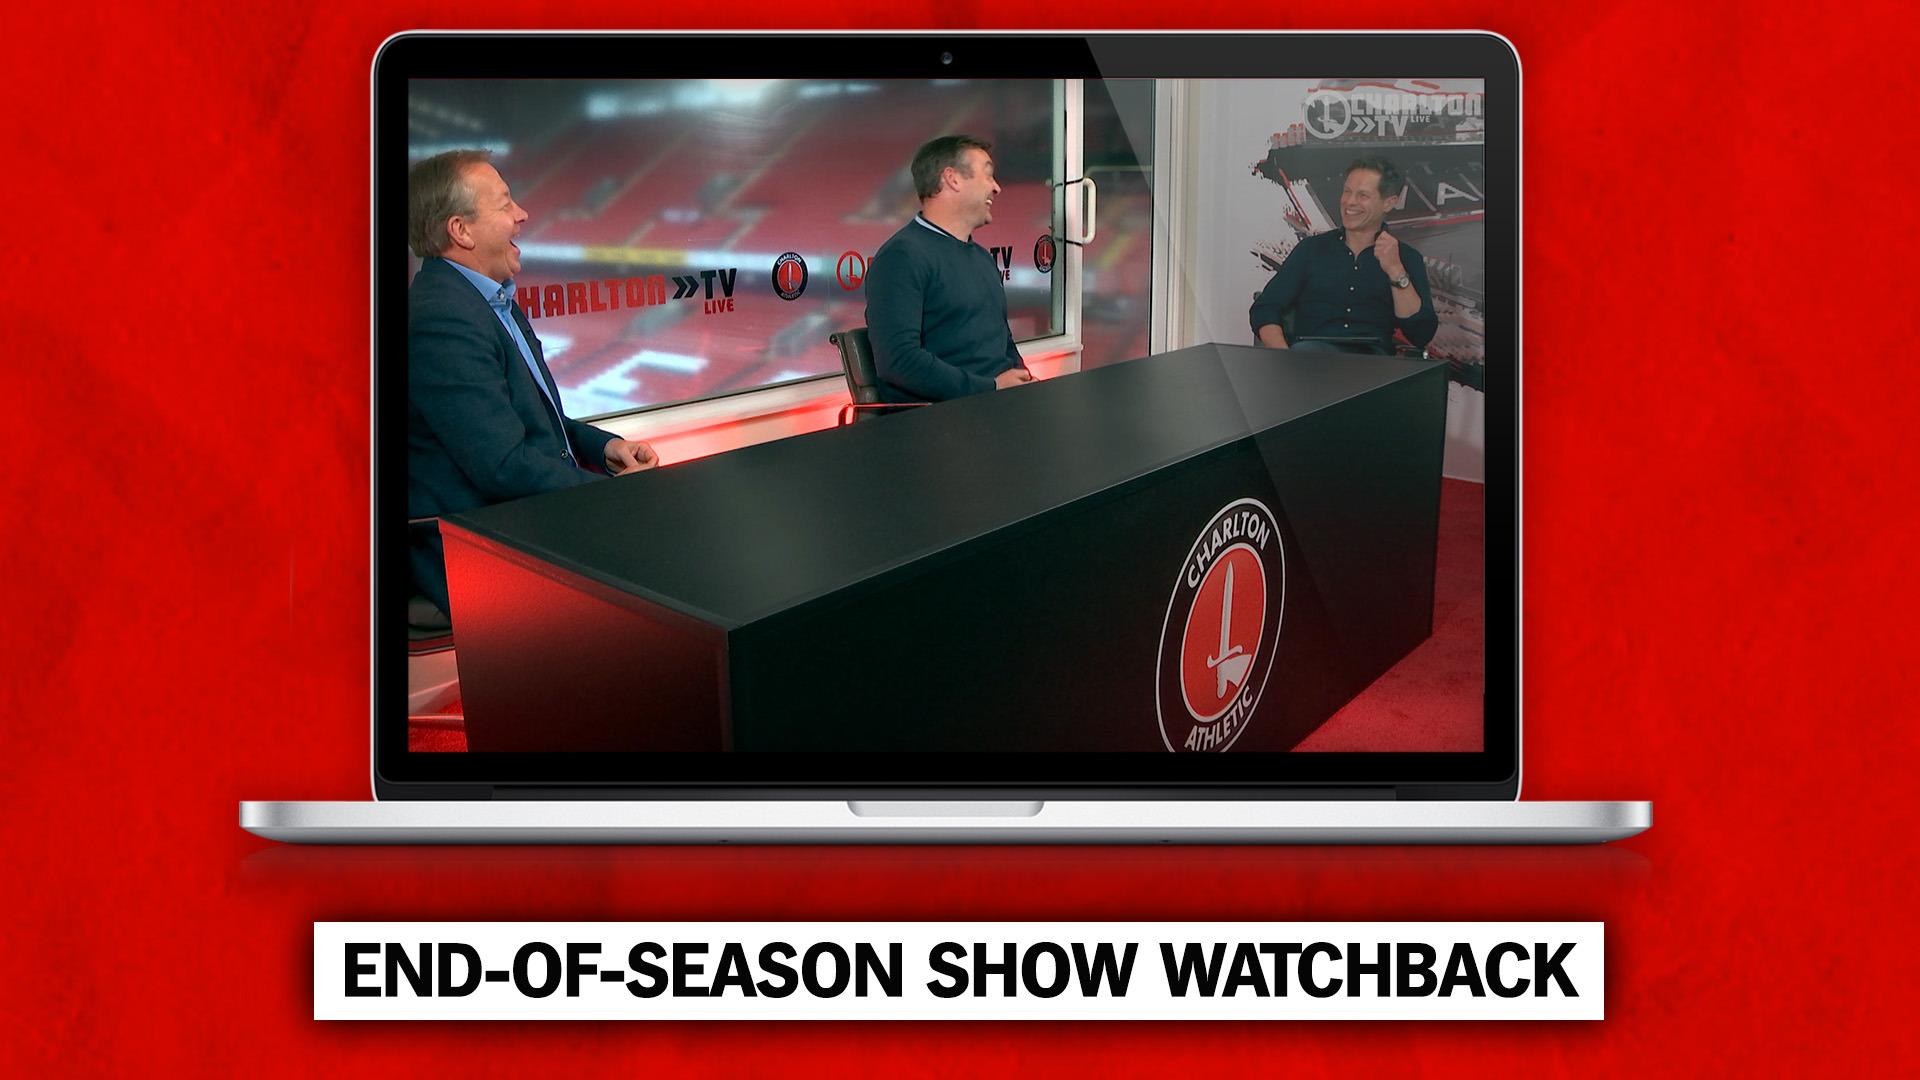 Charlton TV | End-of-season show 2020/21